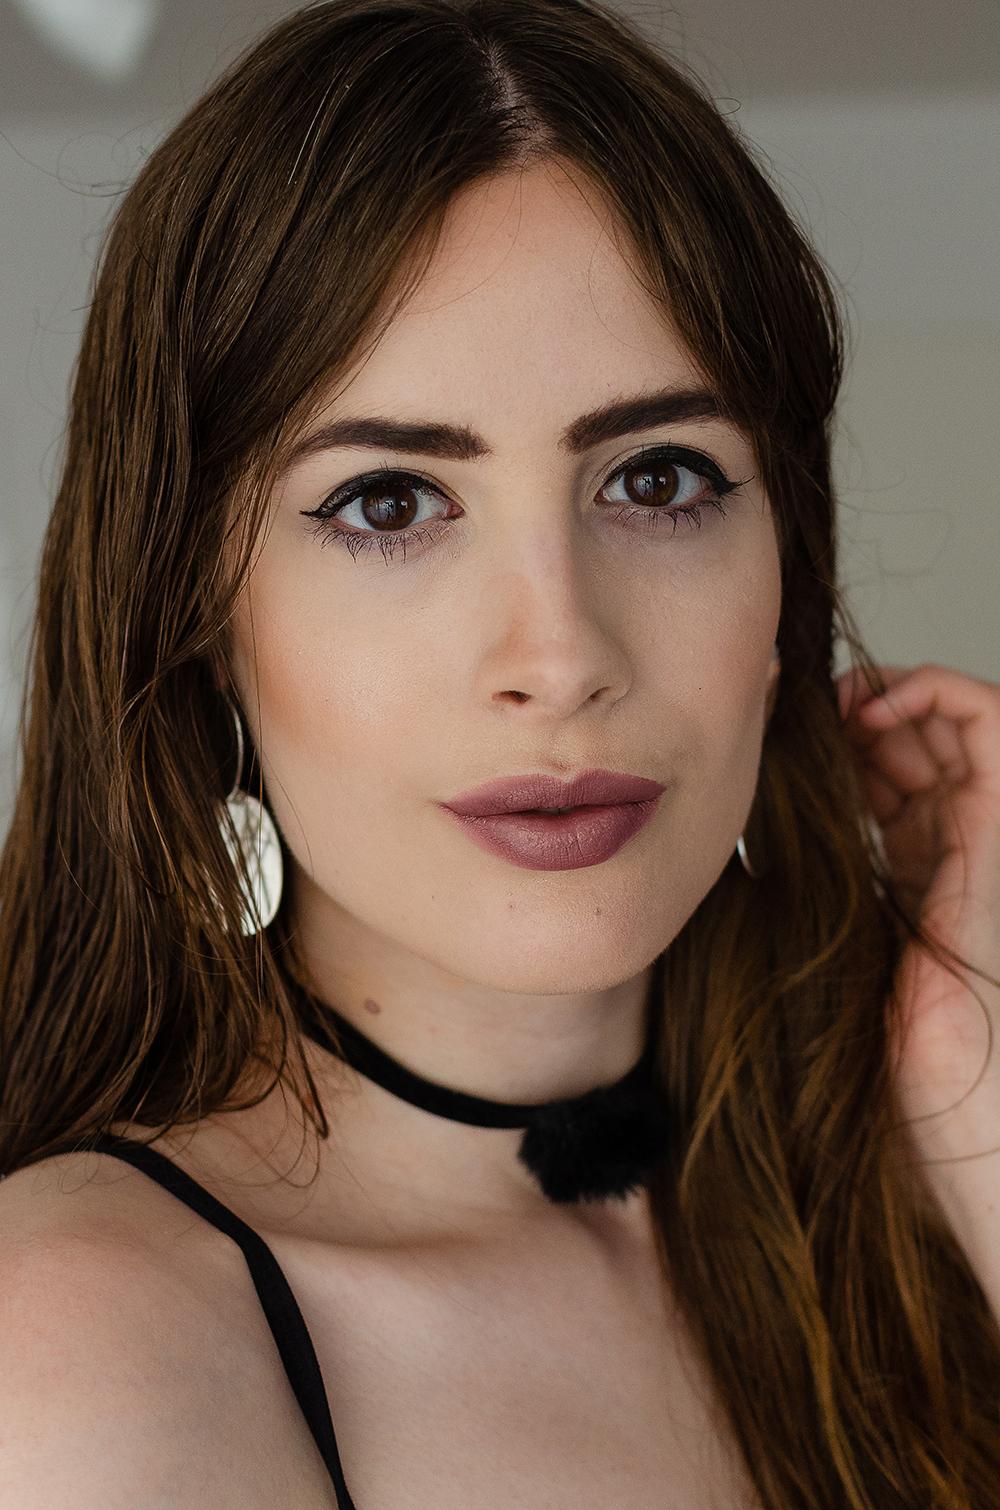 10 Minuten Alltags Make-Up-Ciaté London-Ciaté Make-Up-Beautyblog-andysparkles